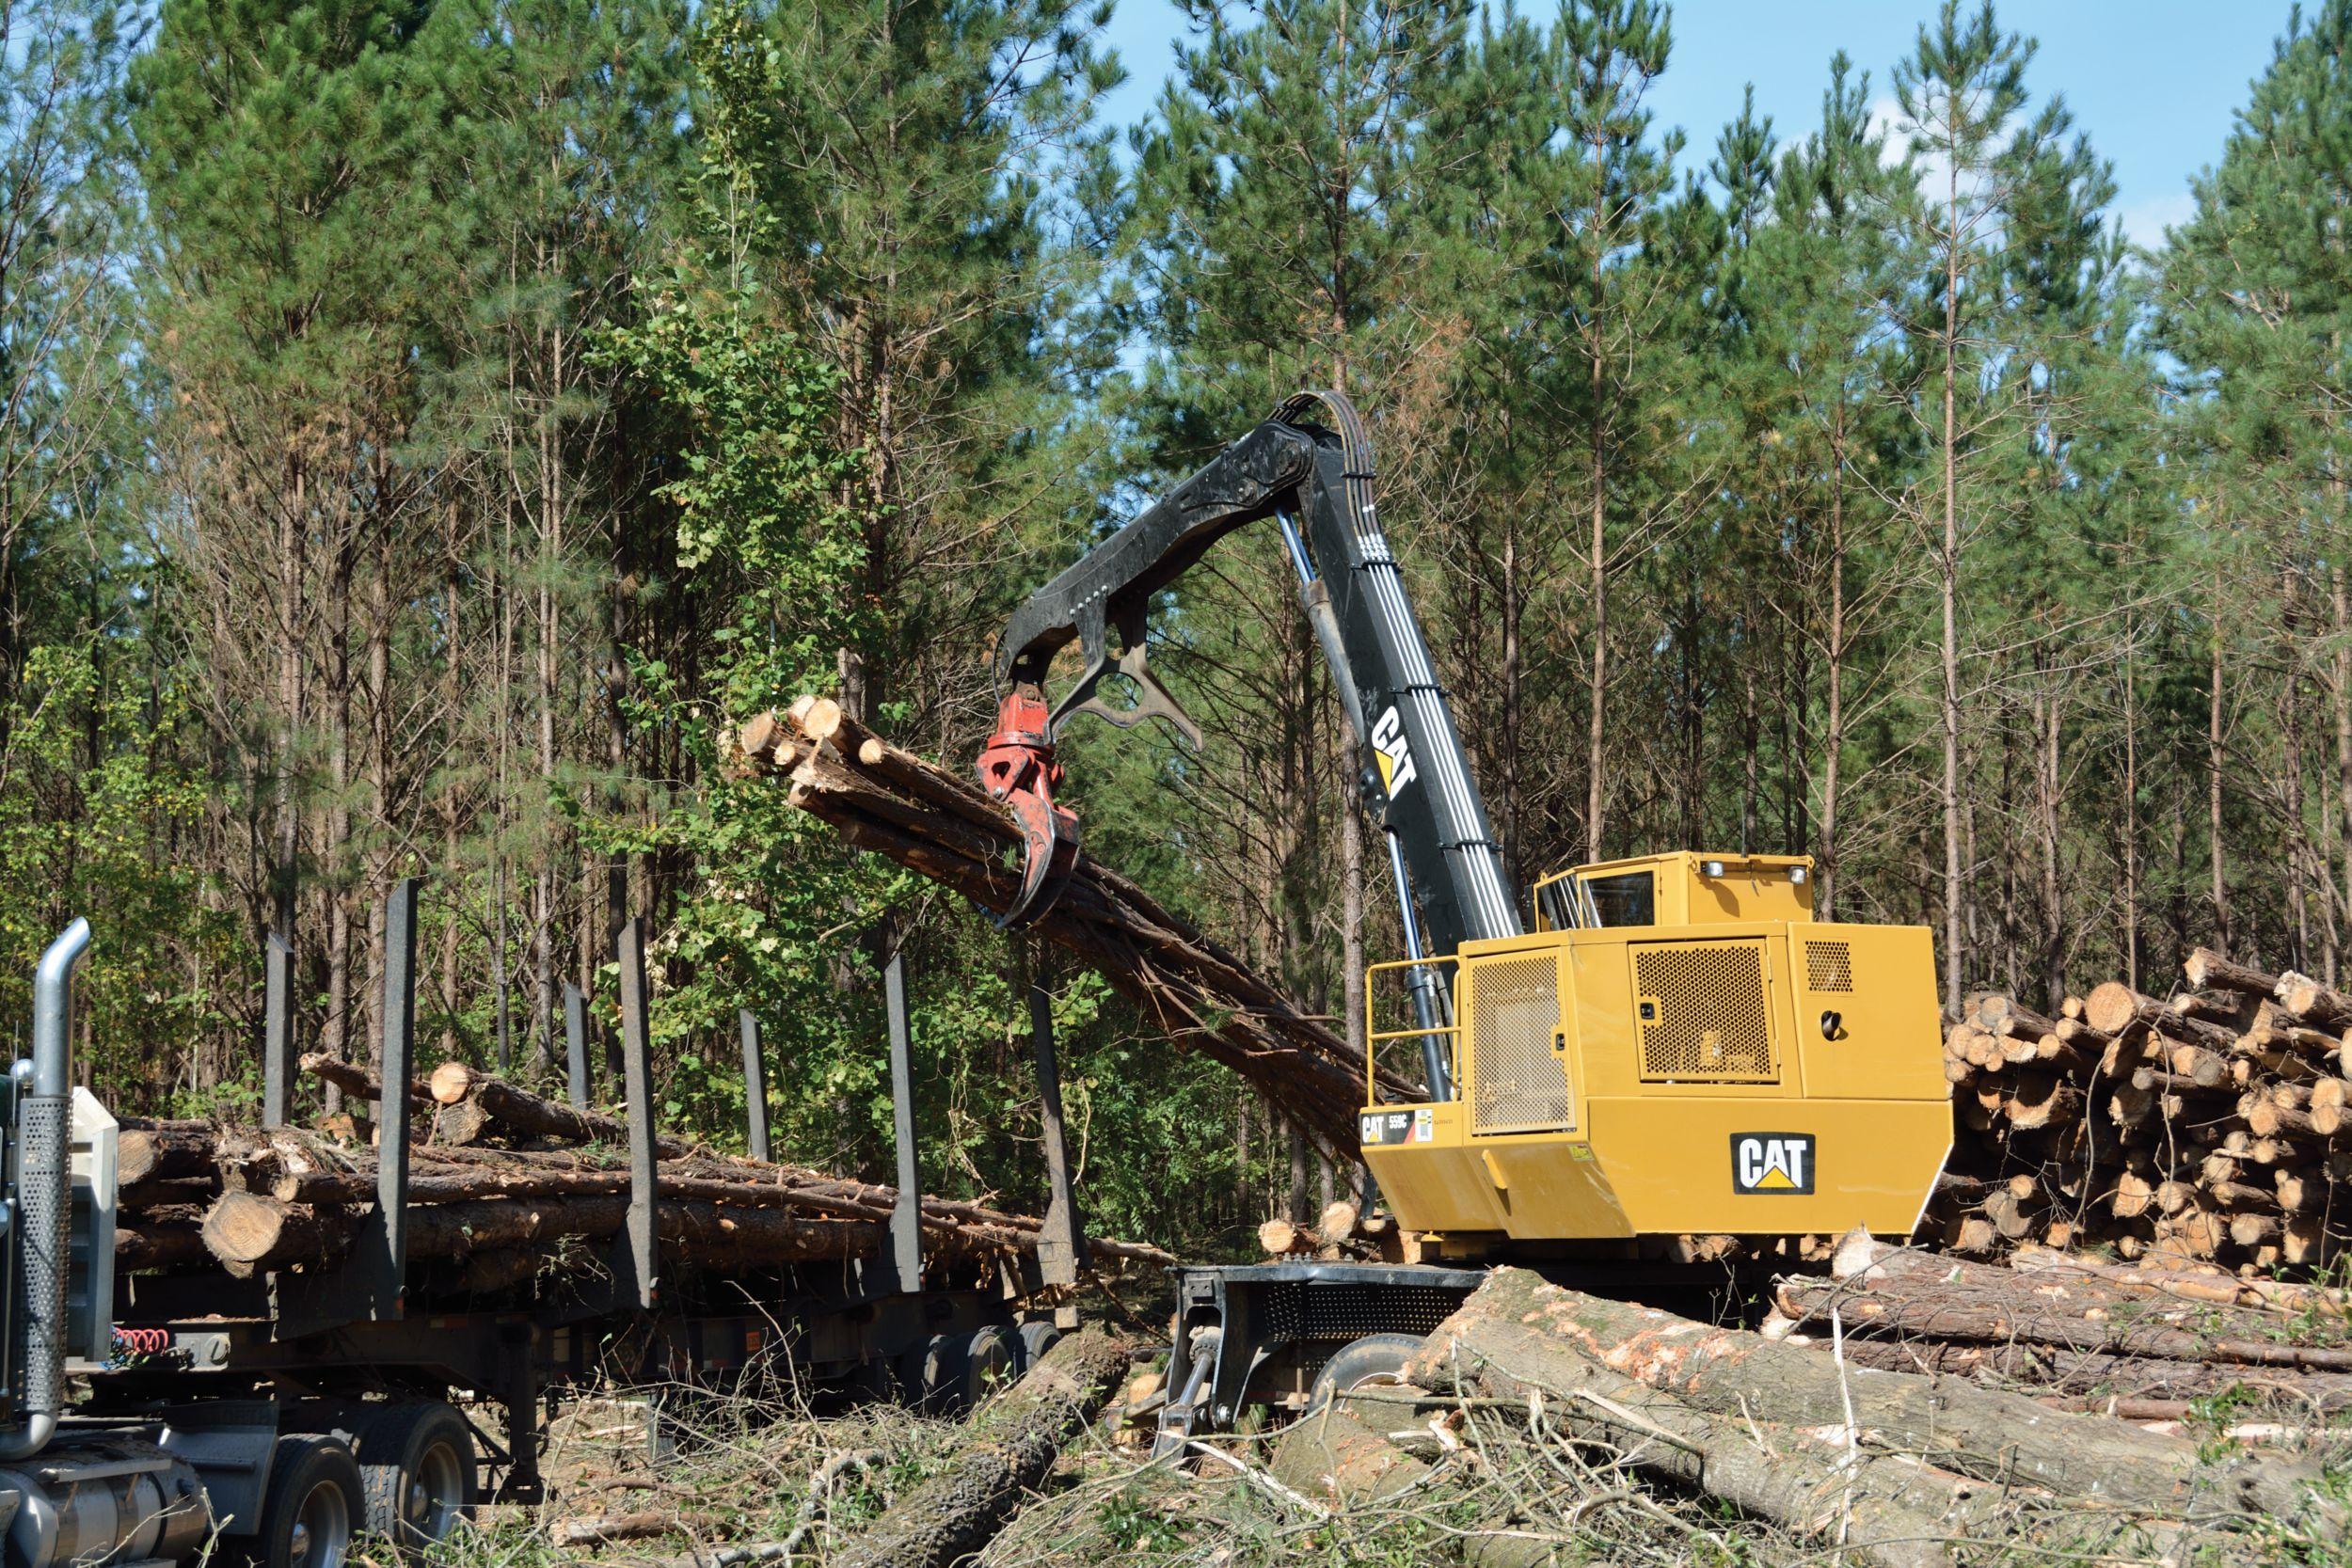 Workhorses of the Woods   Biomassmagazine.com   Cat Forestry Equipment